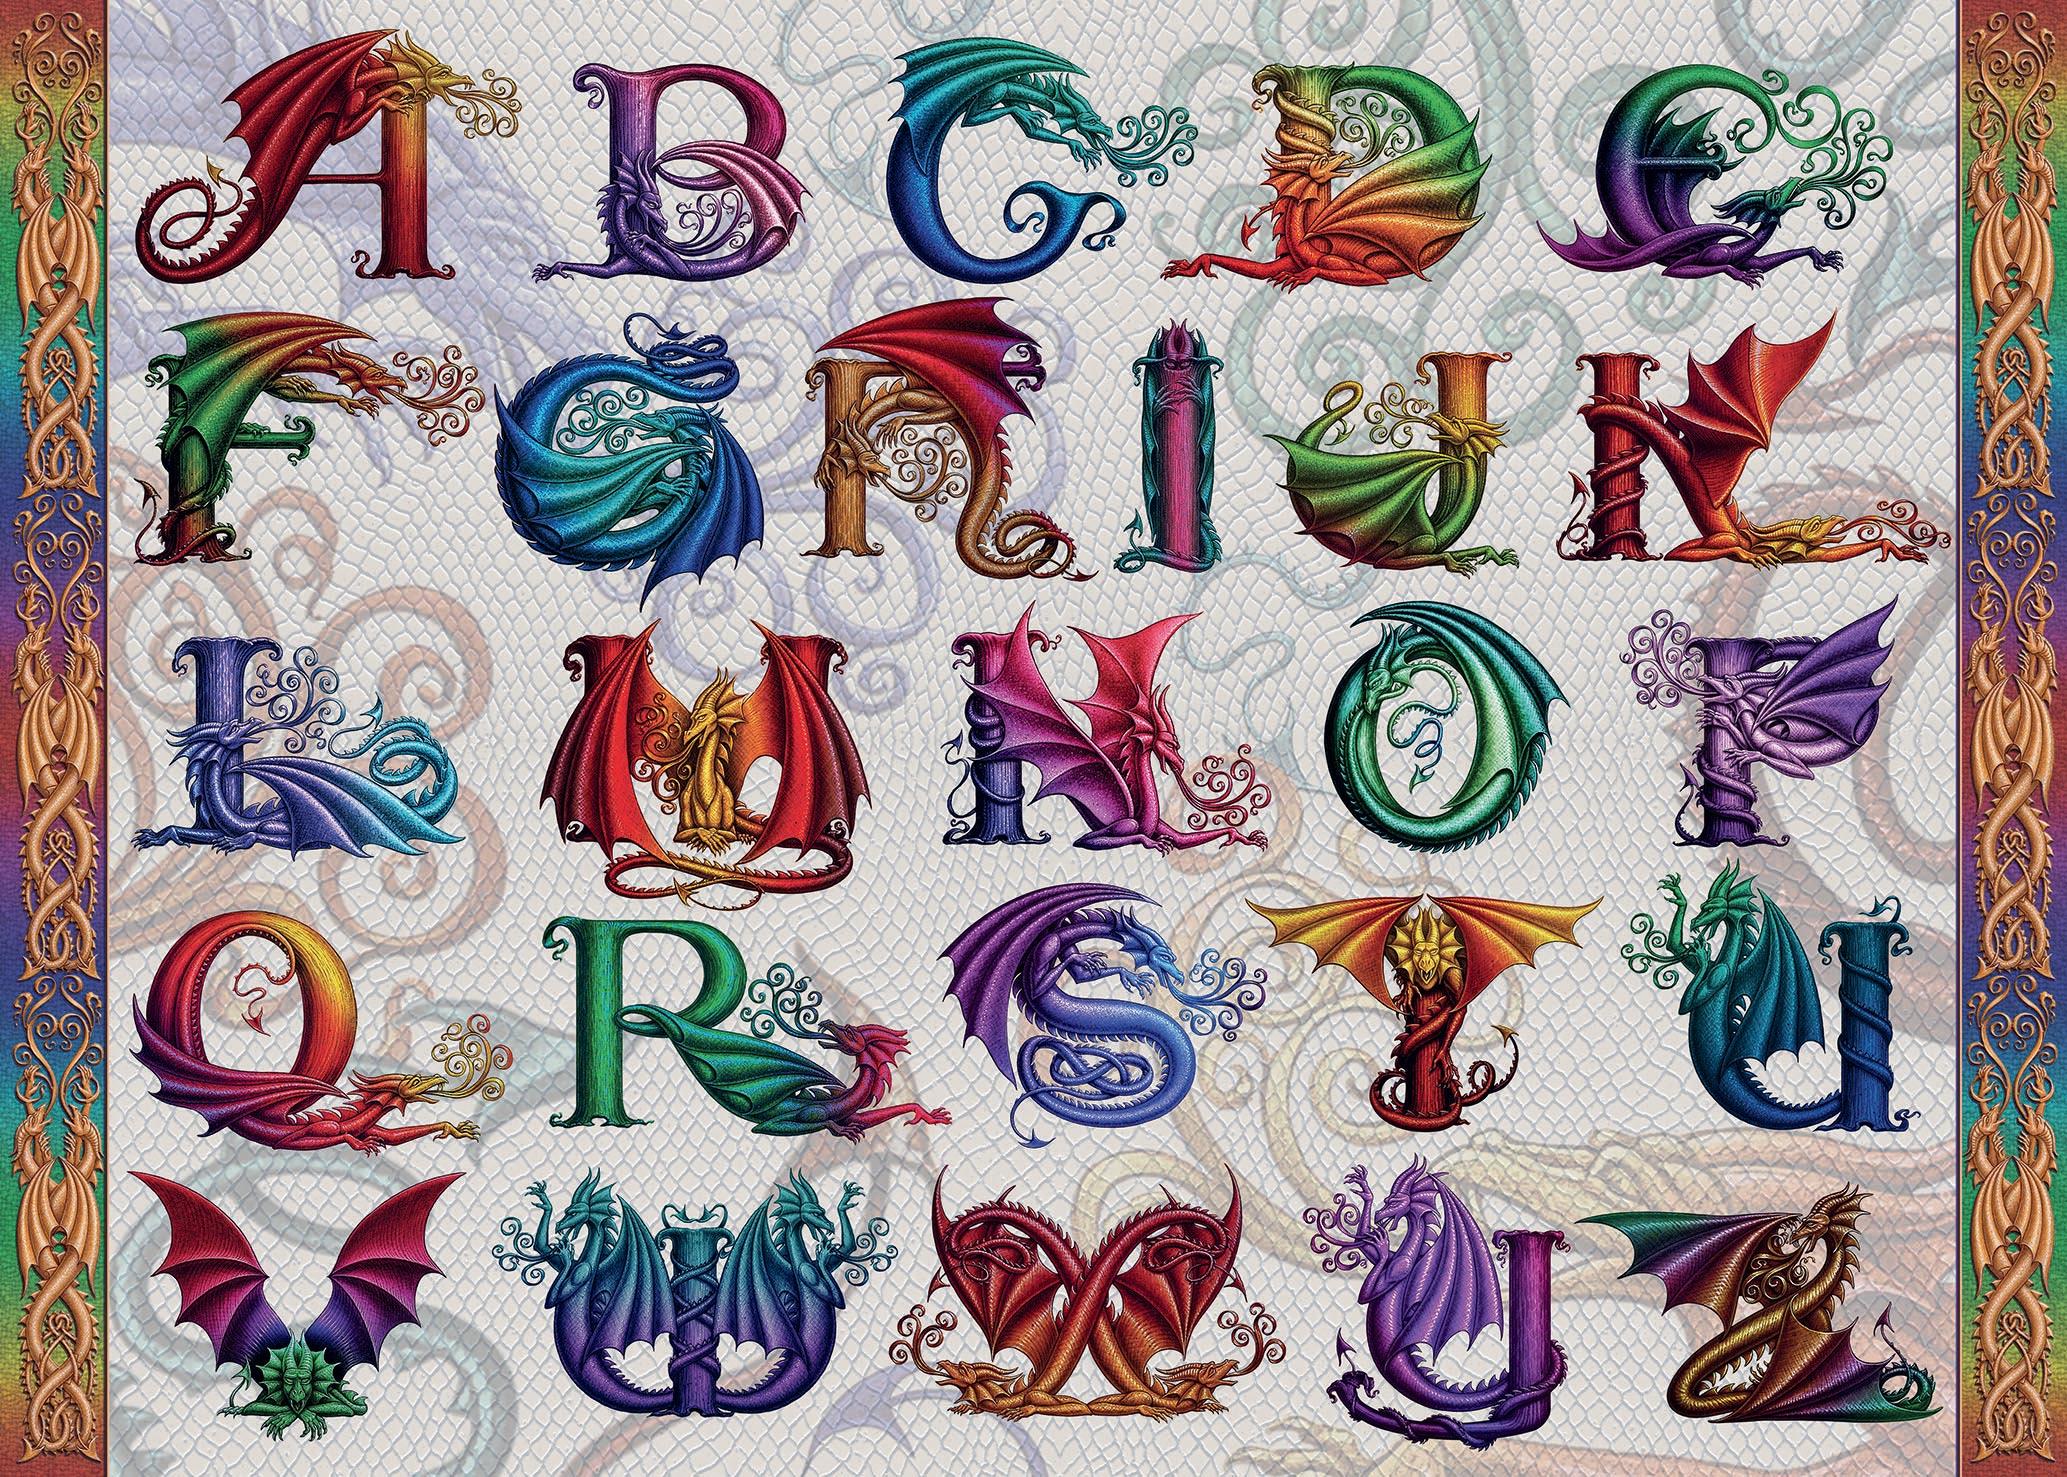 Dragon Alphabet Dragons Jigsaw Puzzle